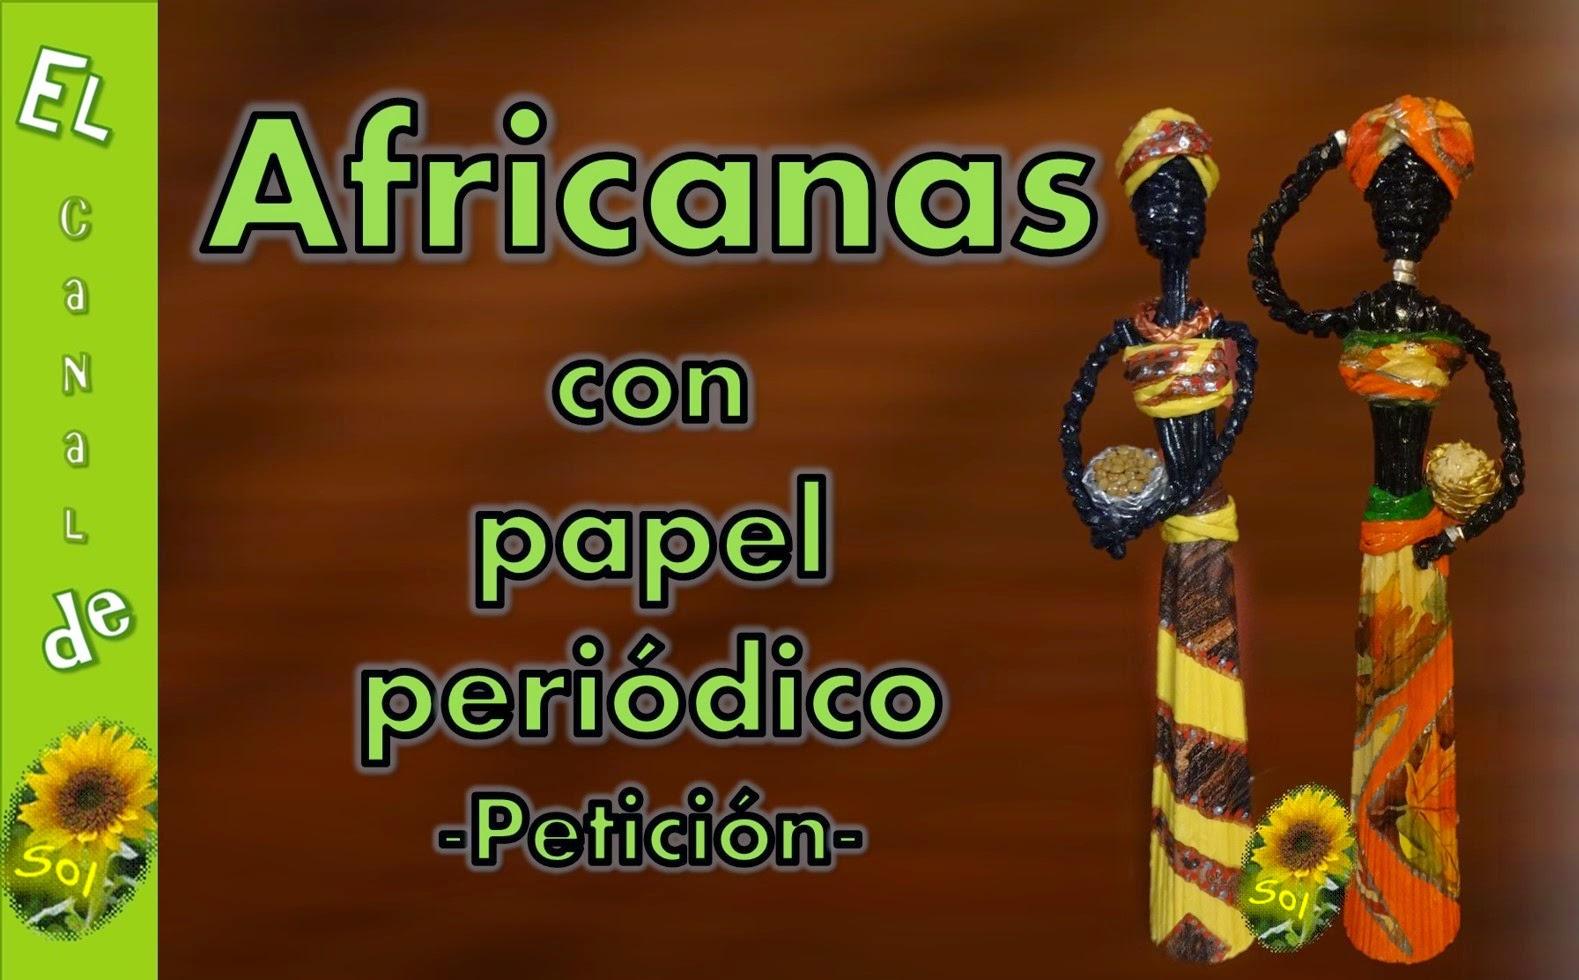 Africanas con papel de peri dico manualidades for Facilisimo com manualidades